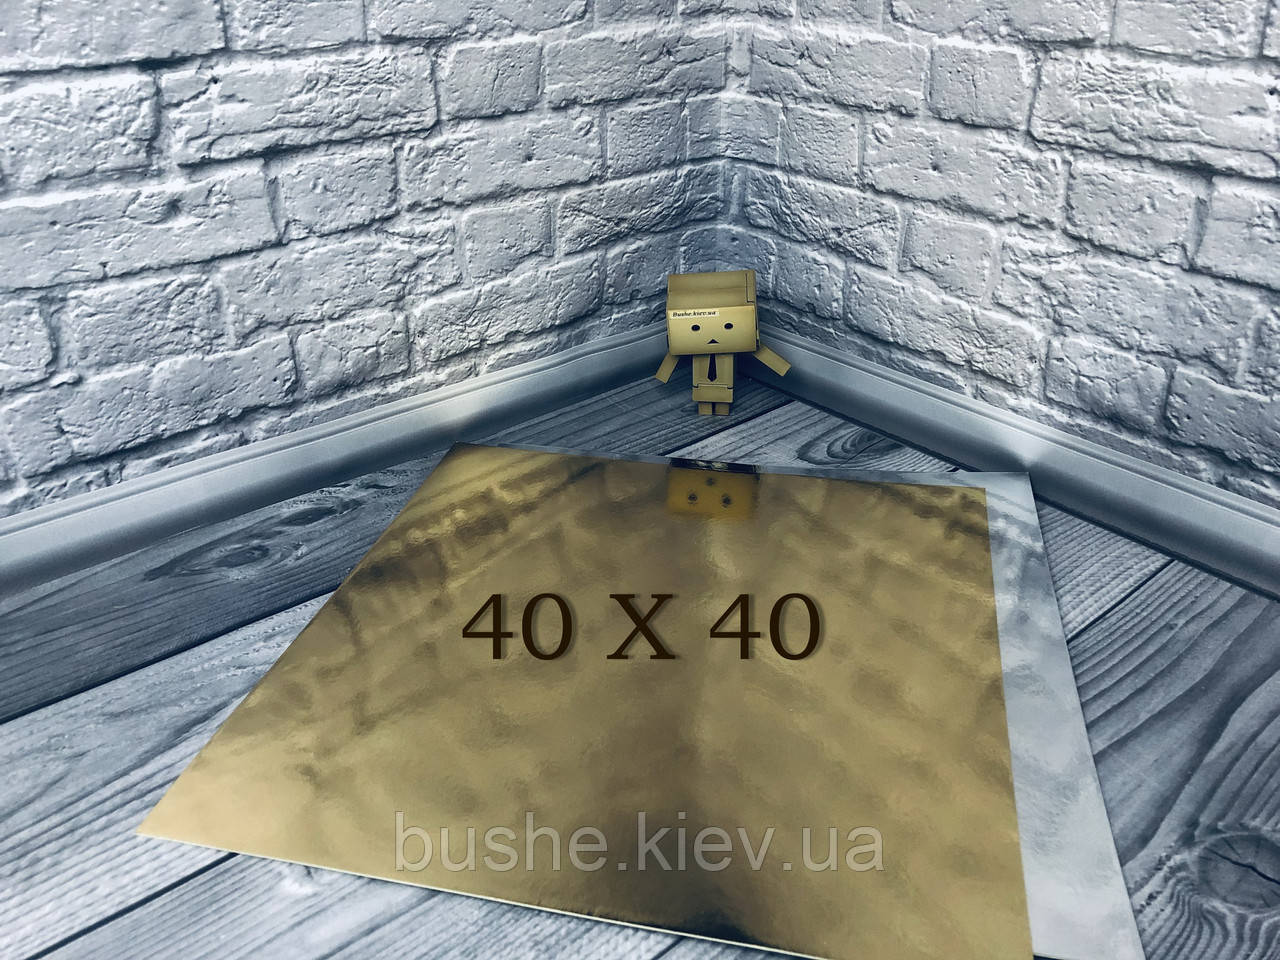 *10 шт* / Подложка для торта 40х40см, Золото-серебро, 400х400мм/мин. 10 шт.